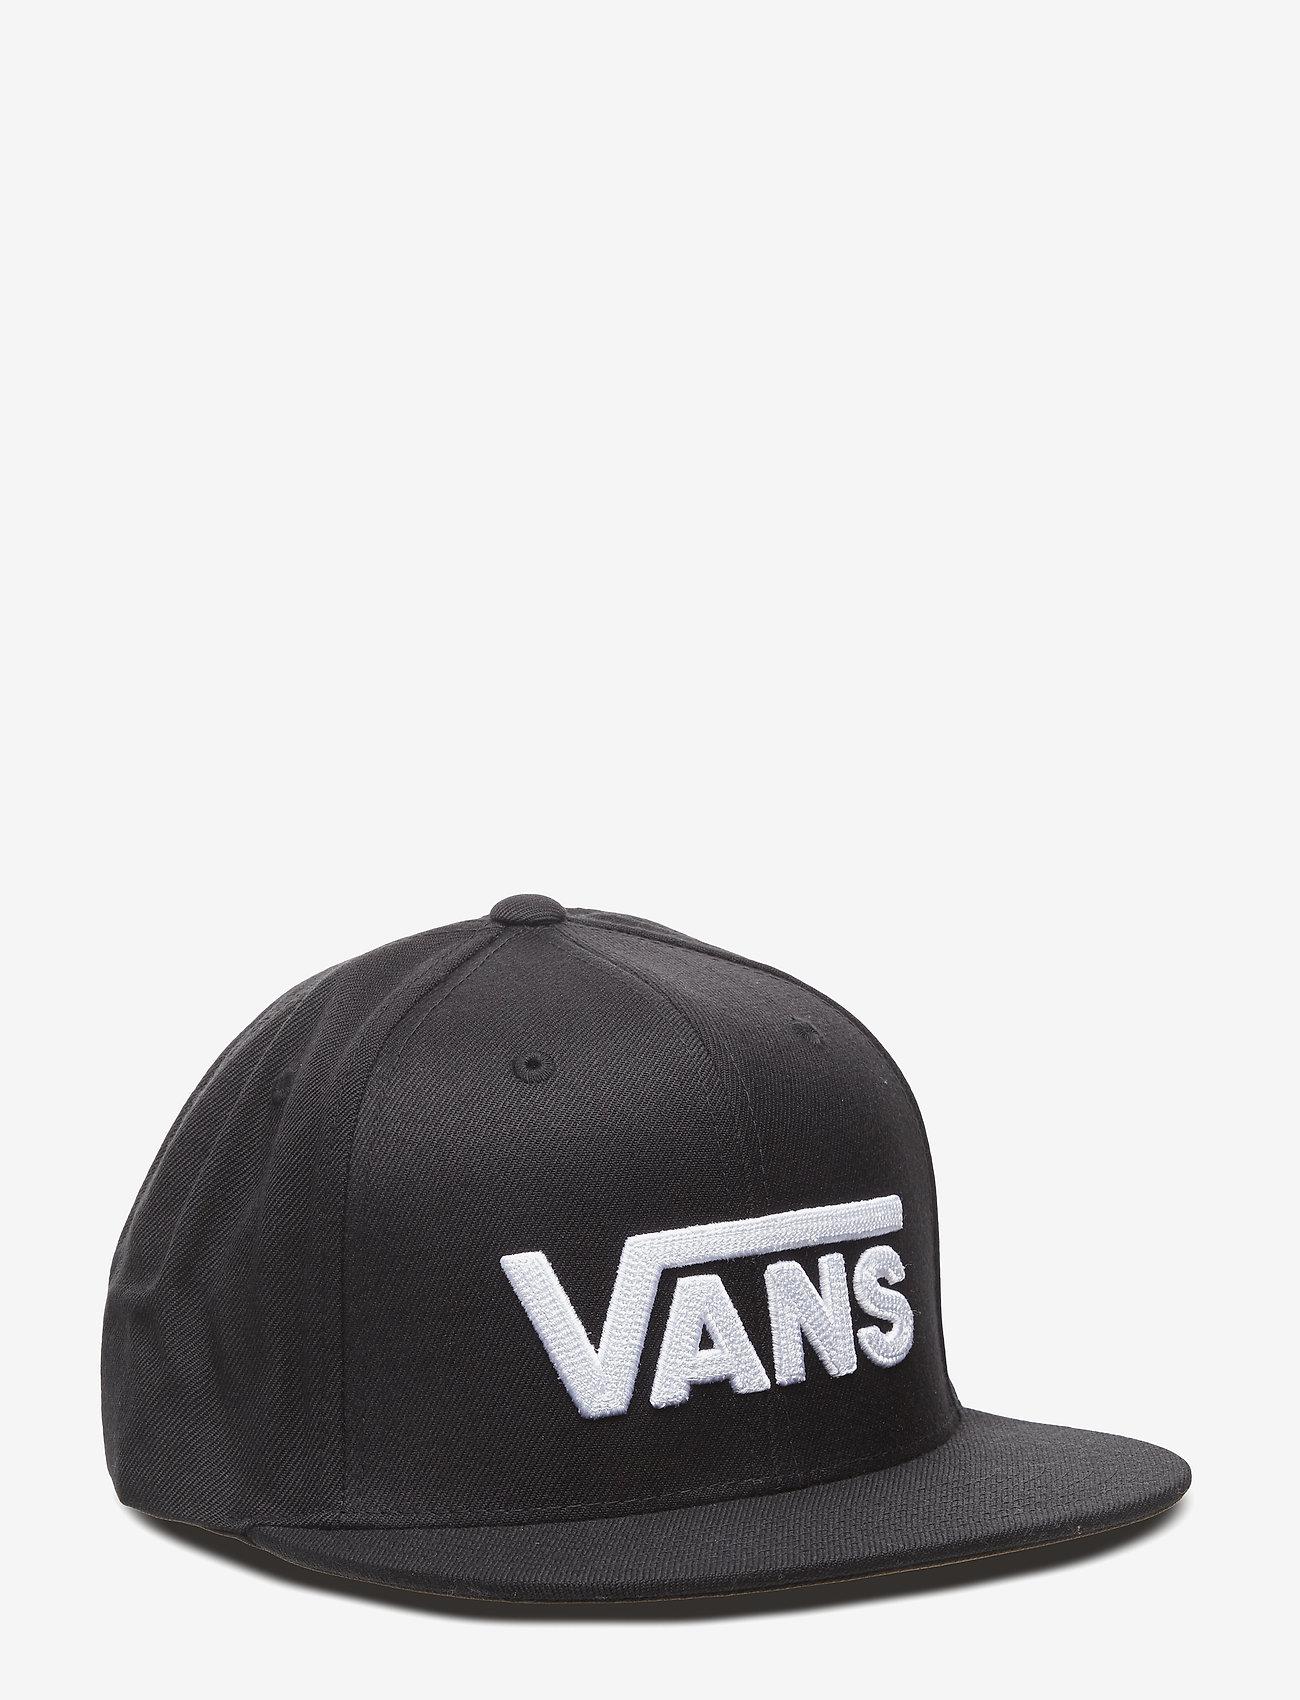 VANS - DROP V II SNAPBACK - petten - black-white - 0